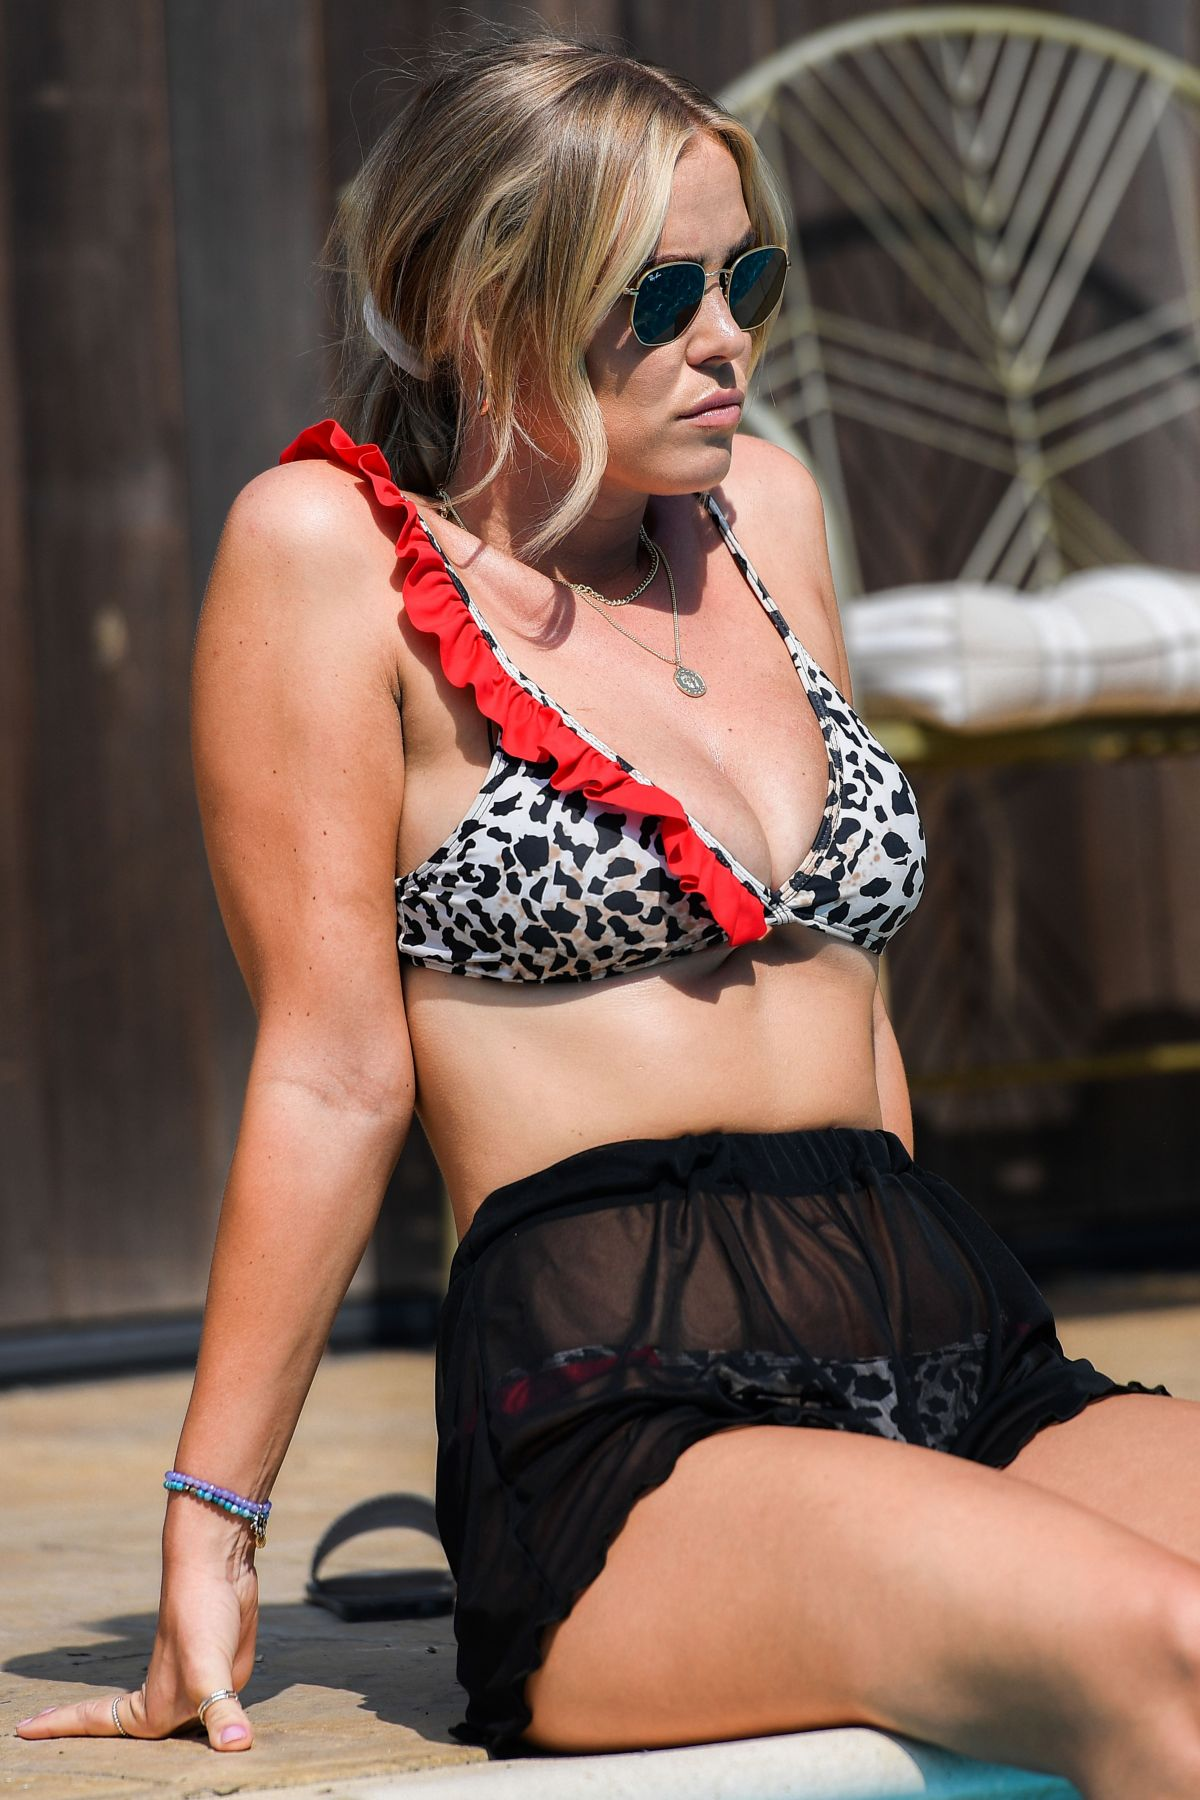 Amber Turner Yazmin Oukhellou Courtney Green Chloe Meadows Bikini Set Towie